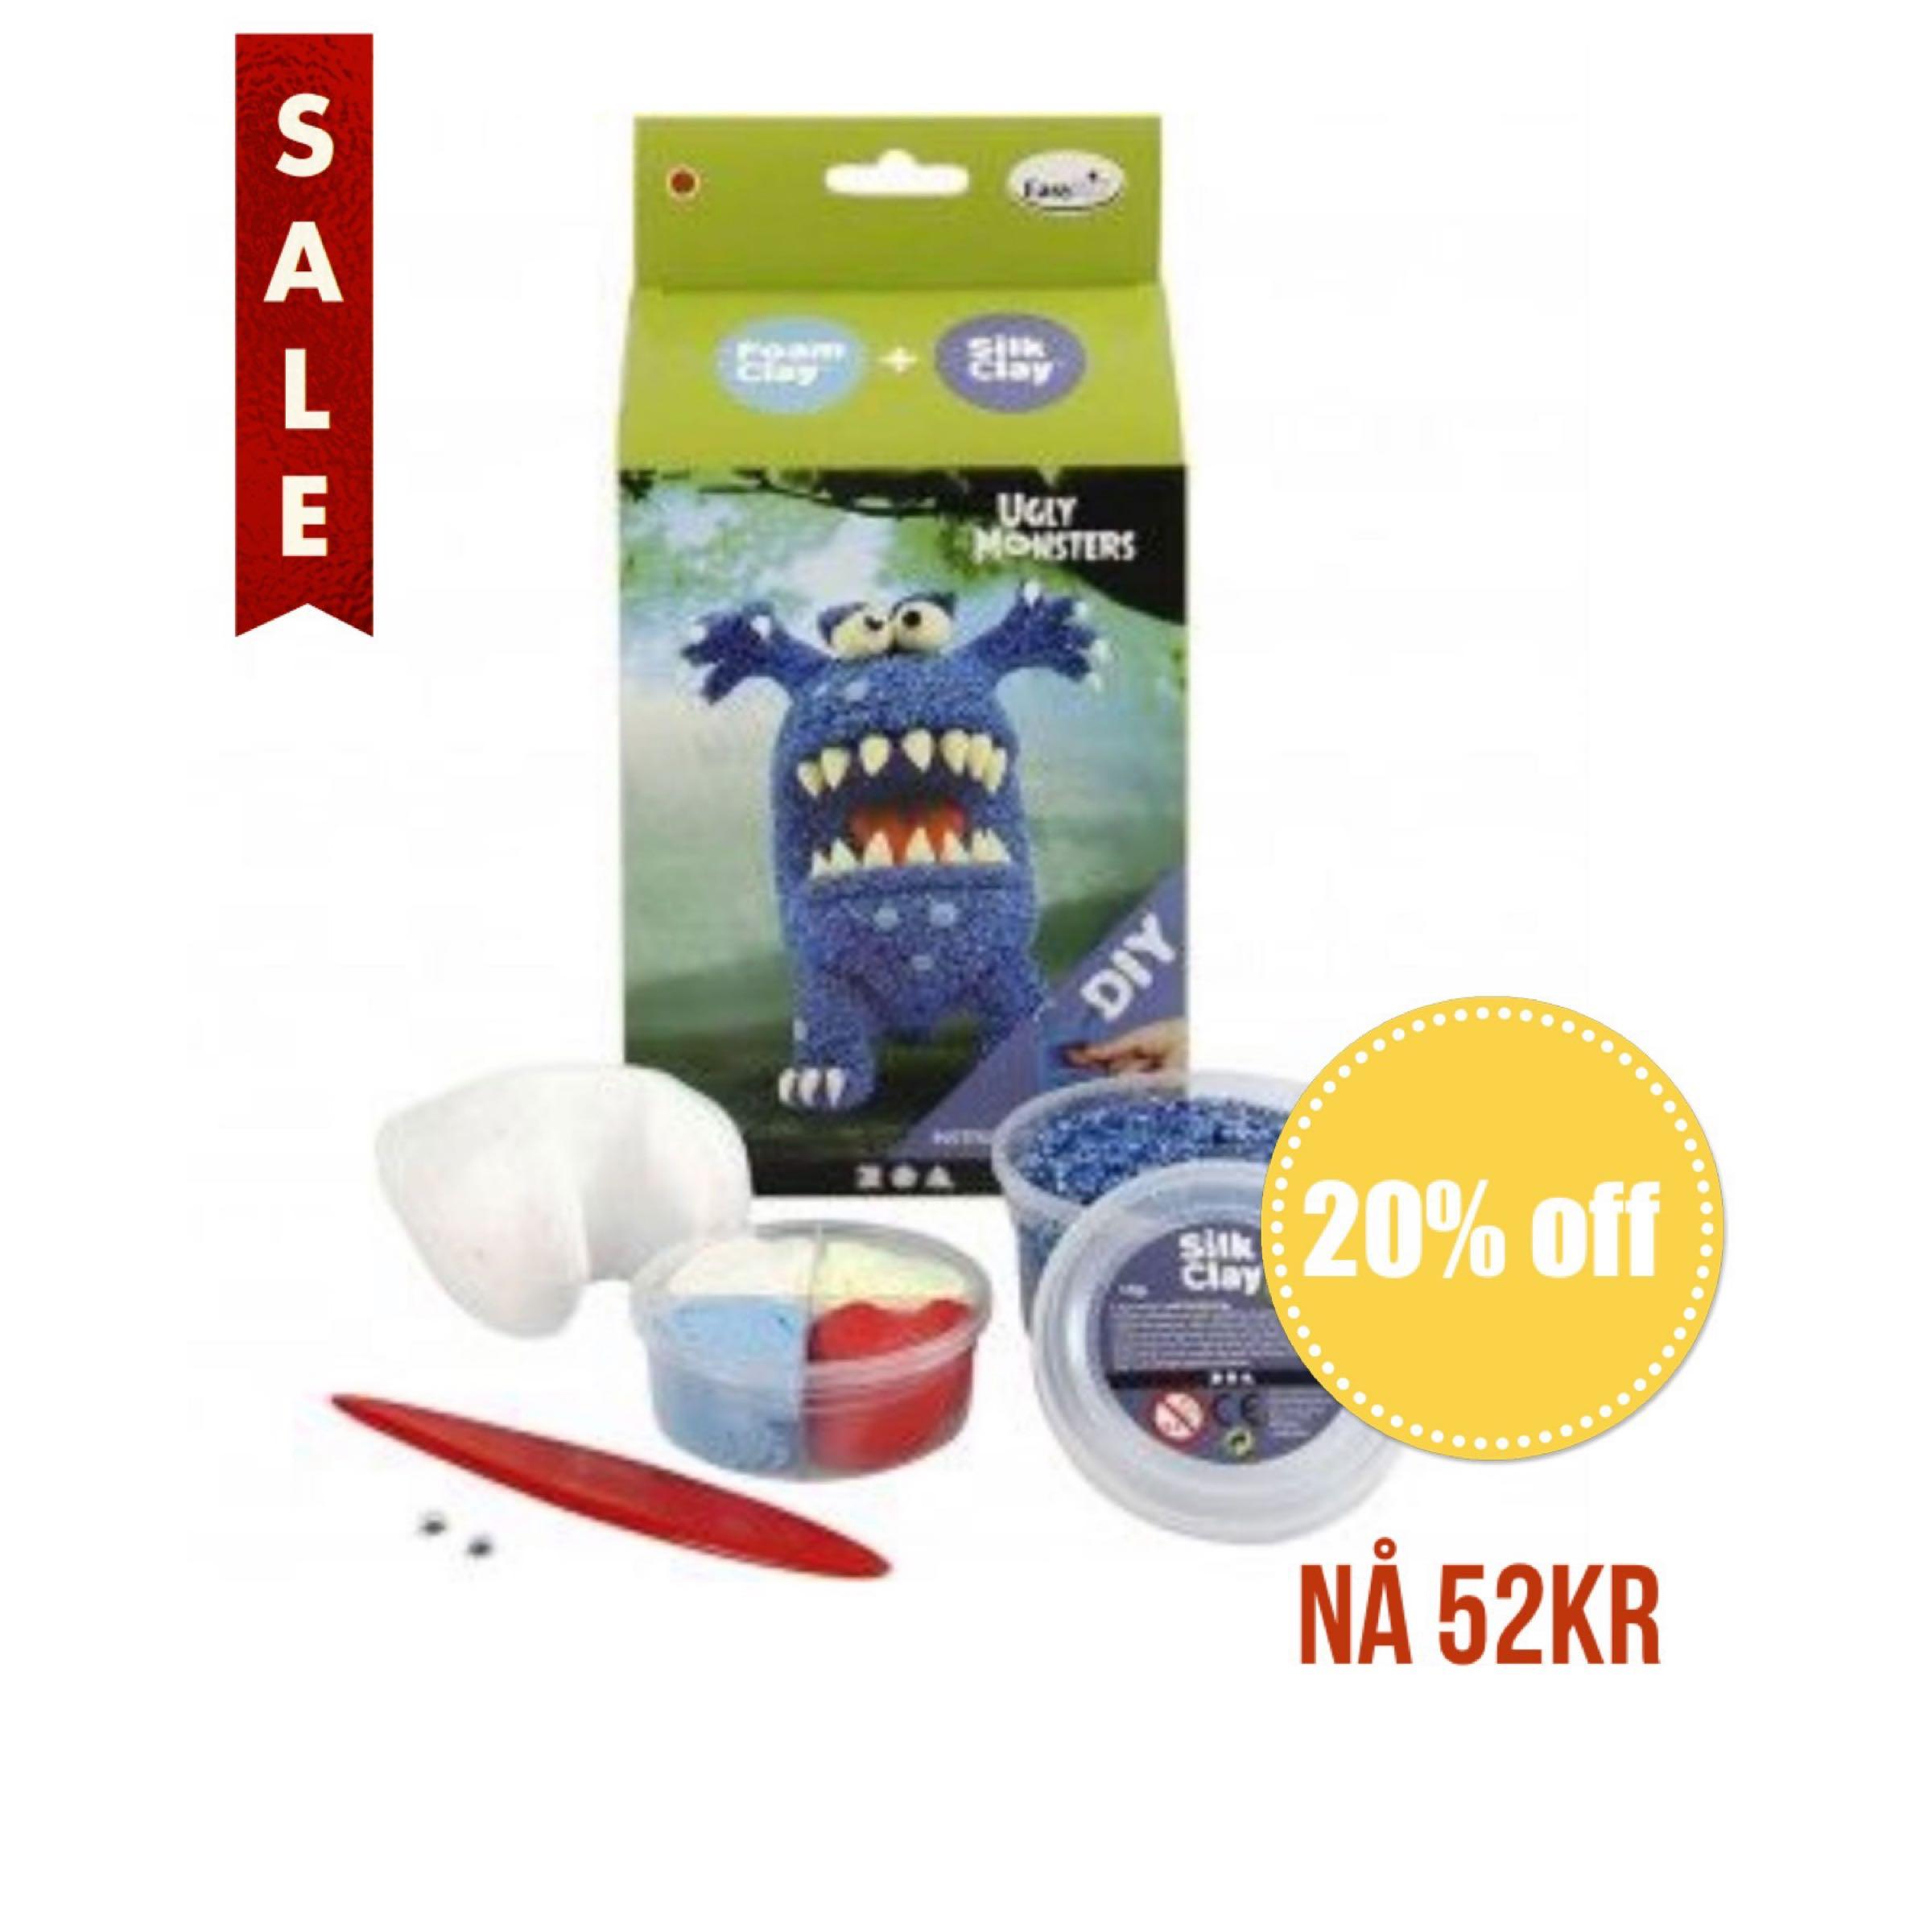 Foam Clay Ugly Monsters Blue DIY Kit